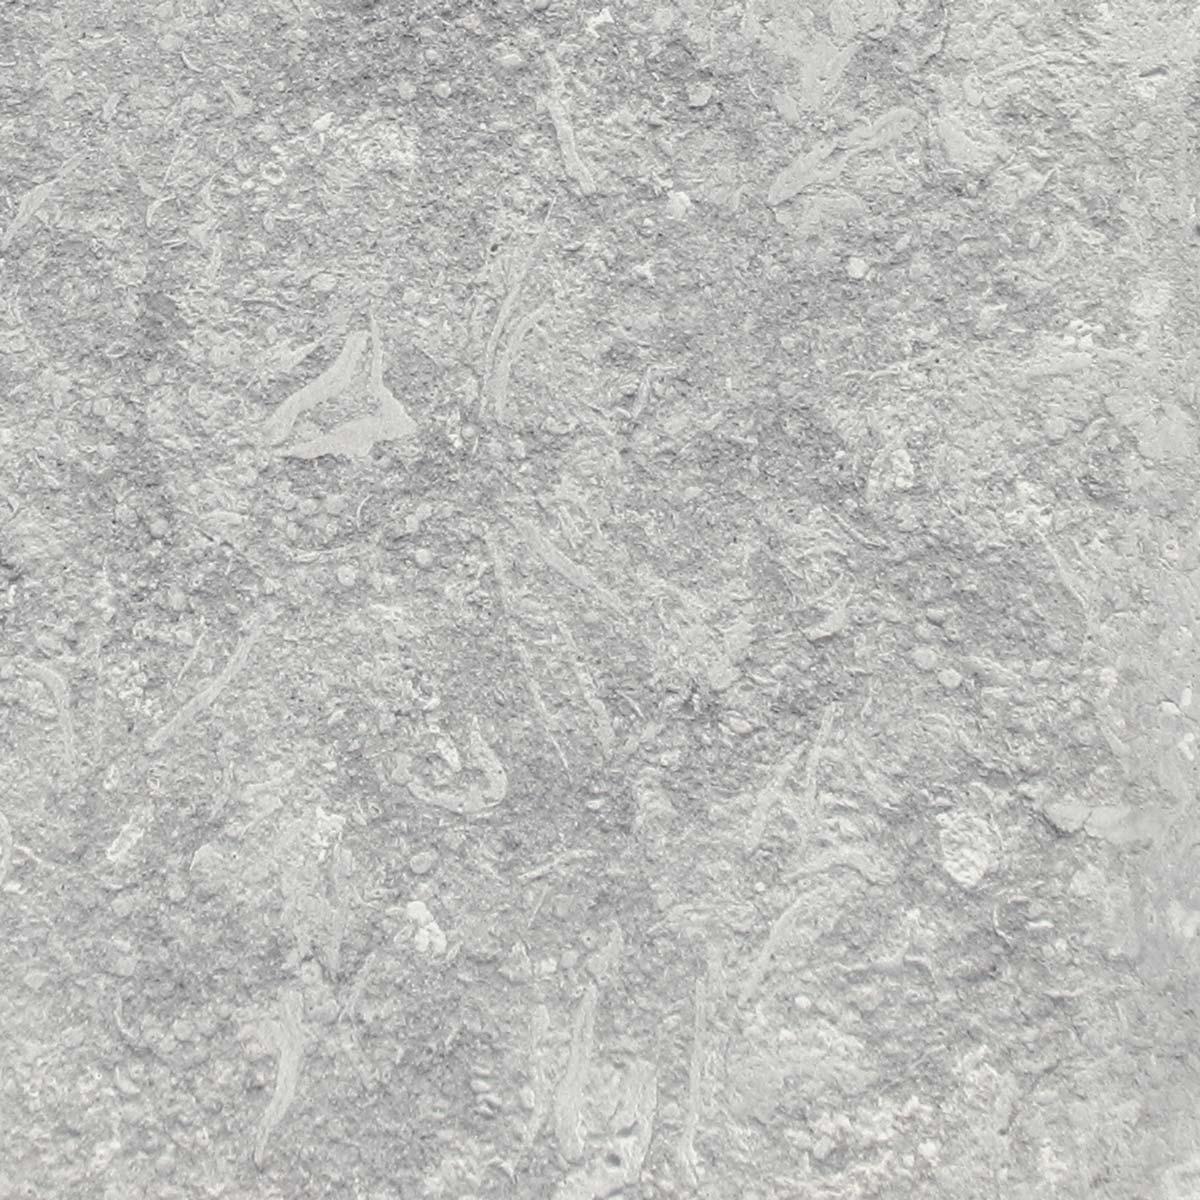 Grigio alpi sabbiato